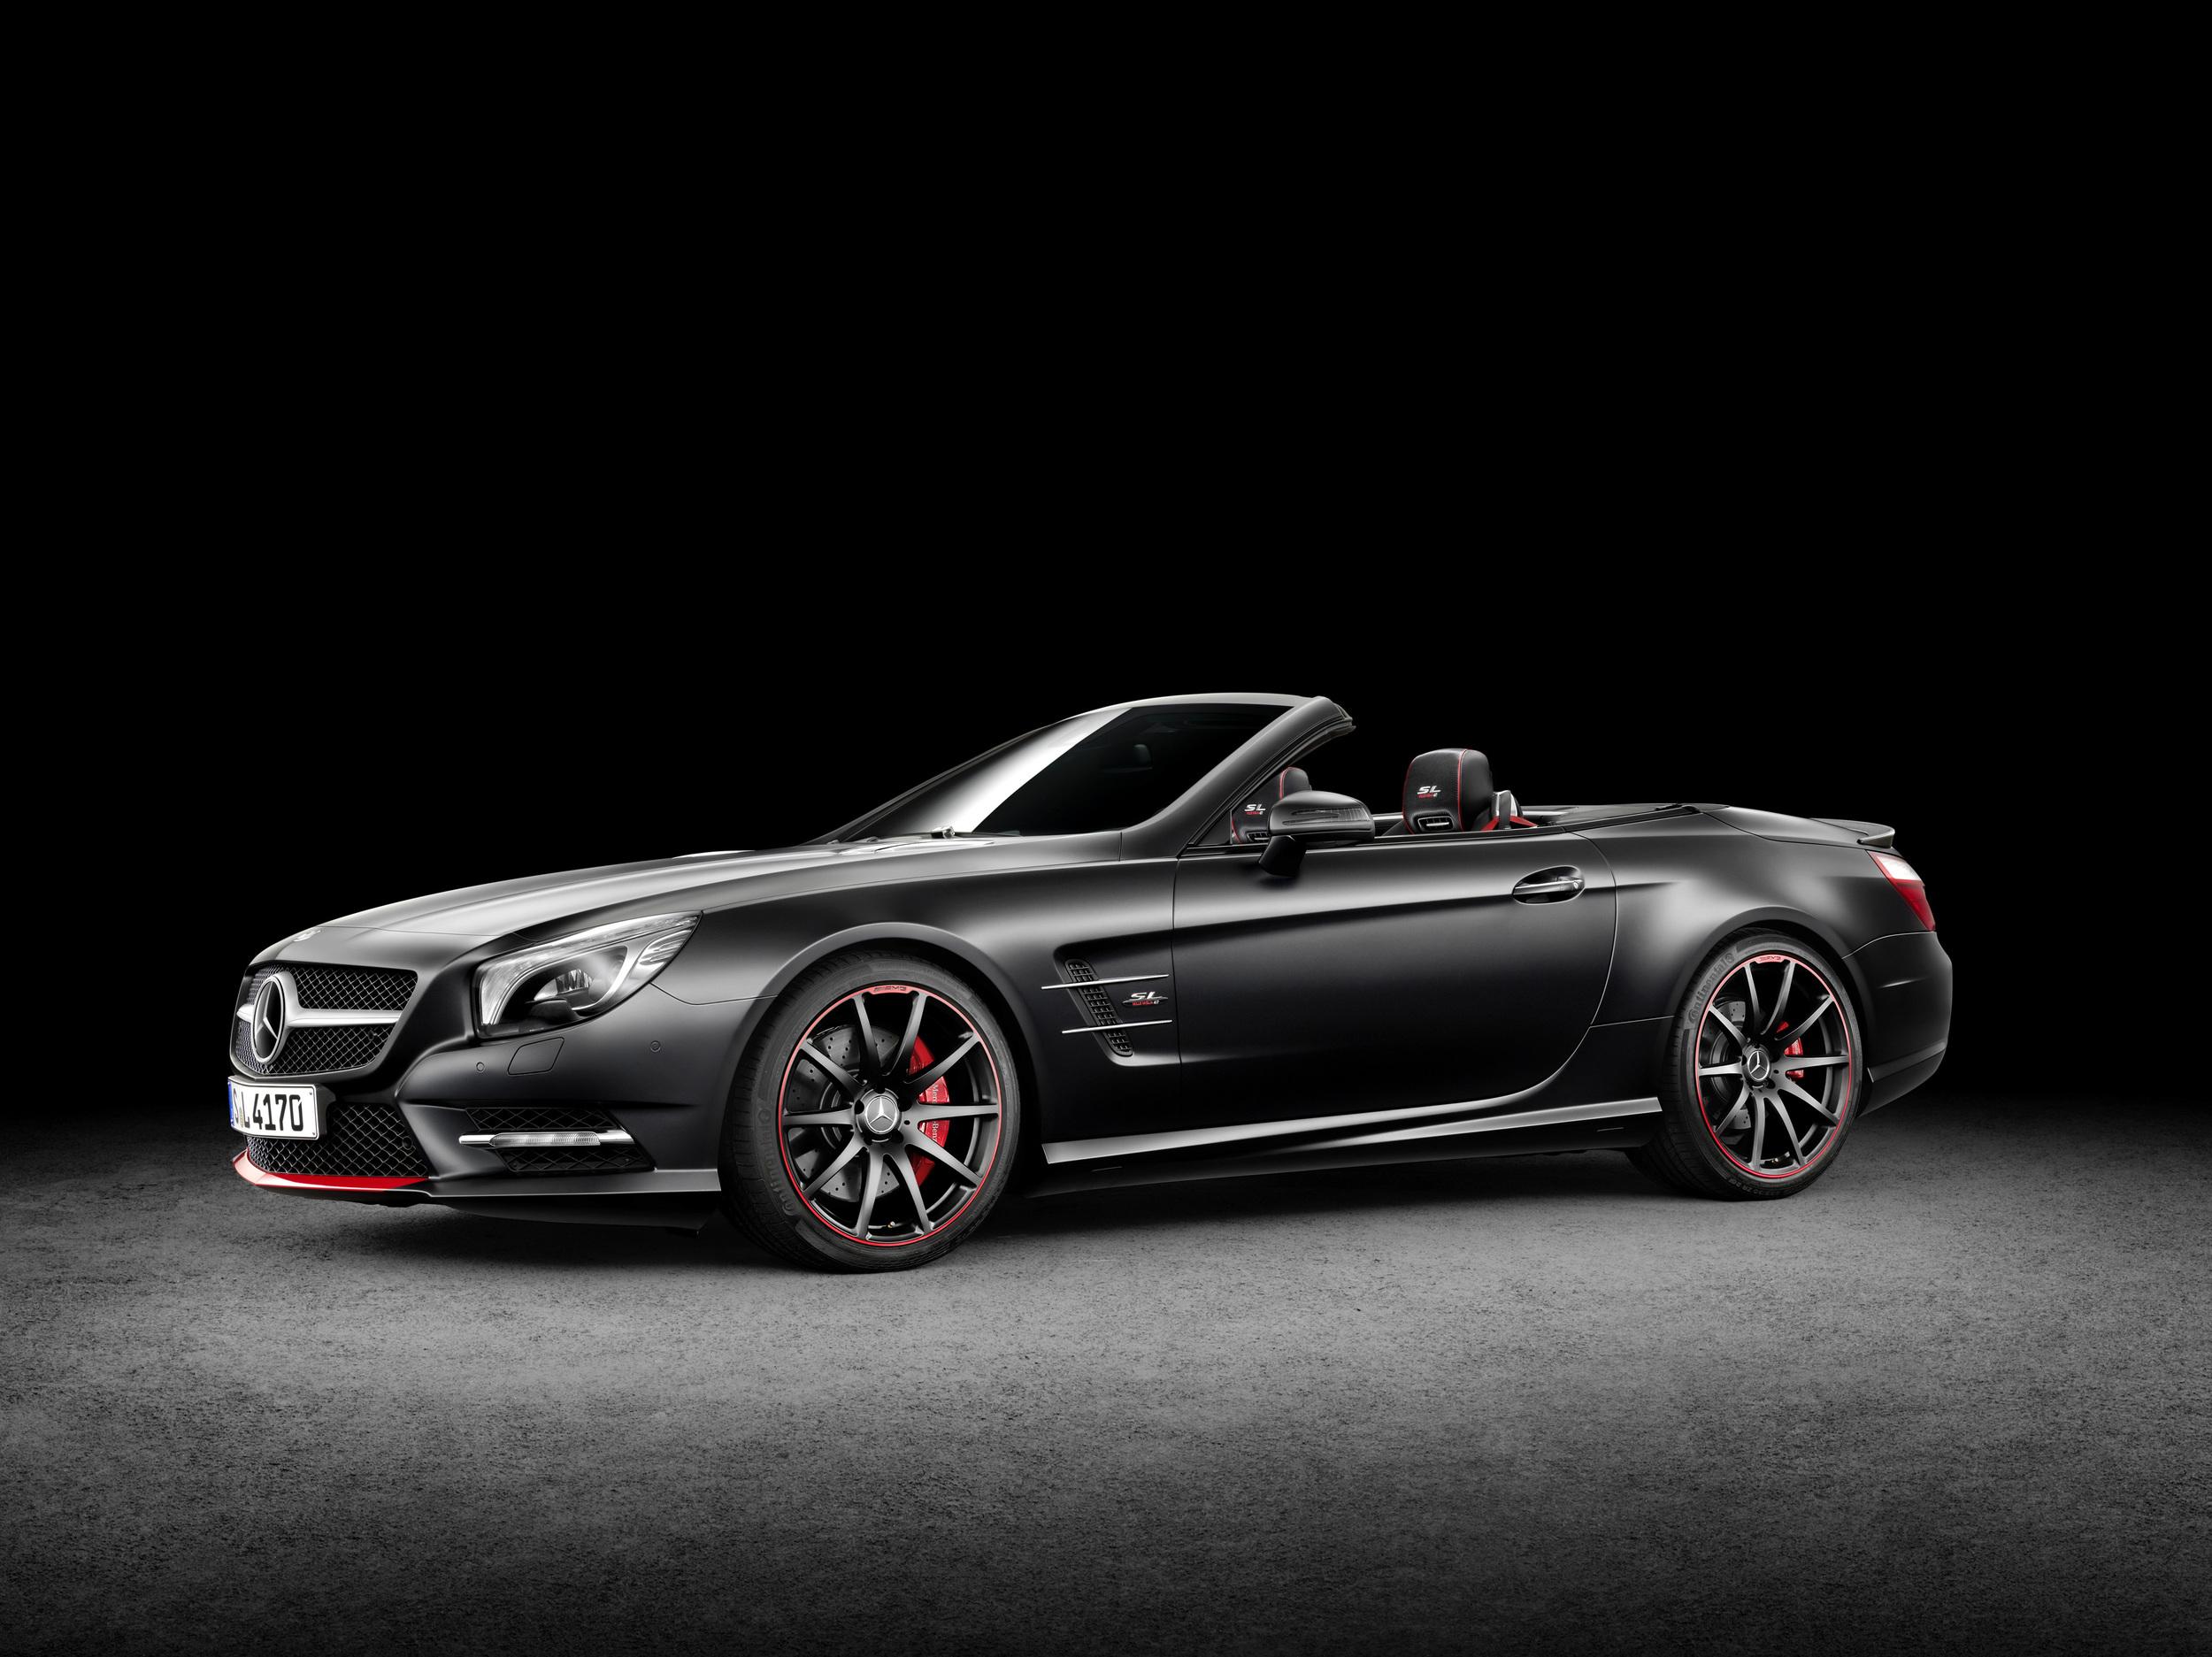 2015 mercedes benz sl550 special edition mille miglia 417 For2015 Mercedes Benz Sl550